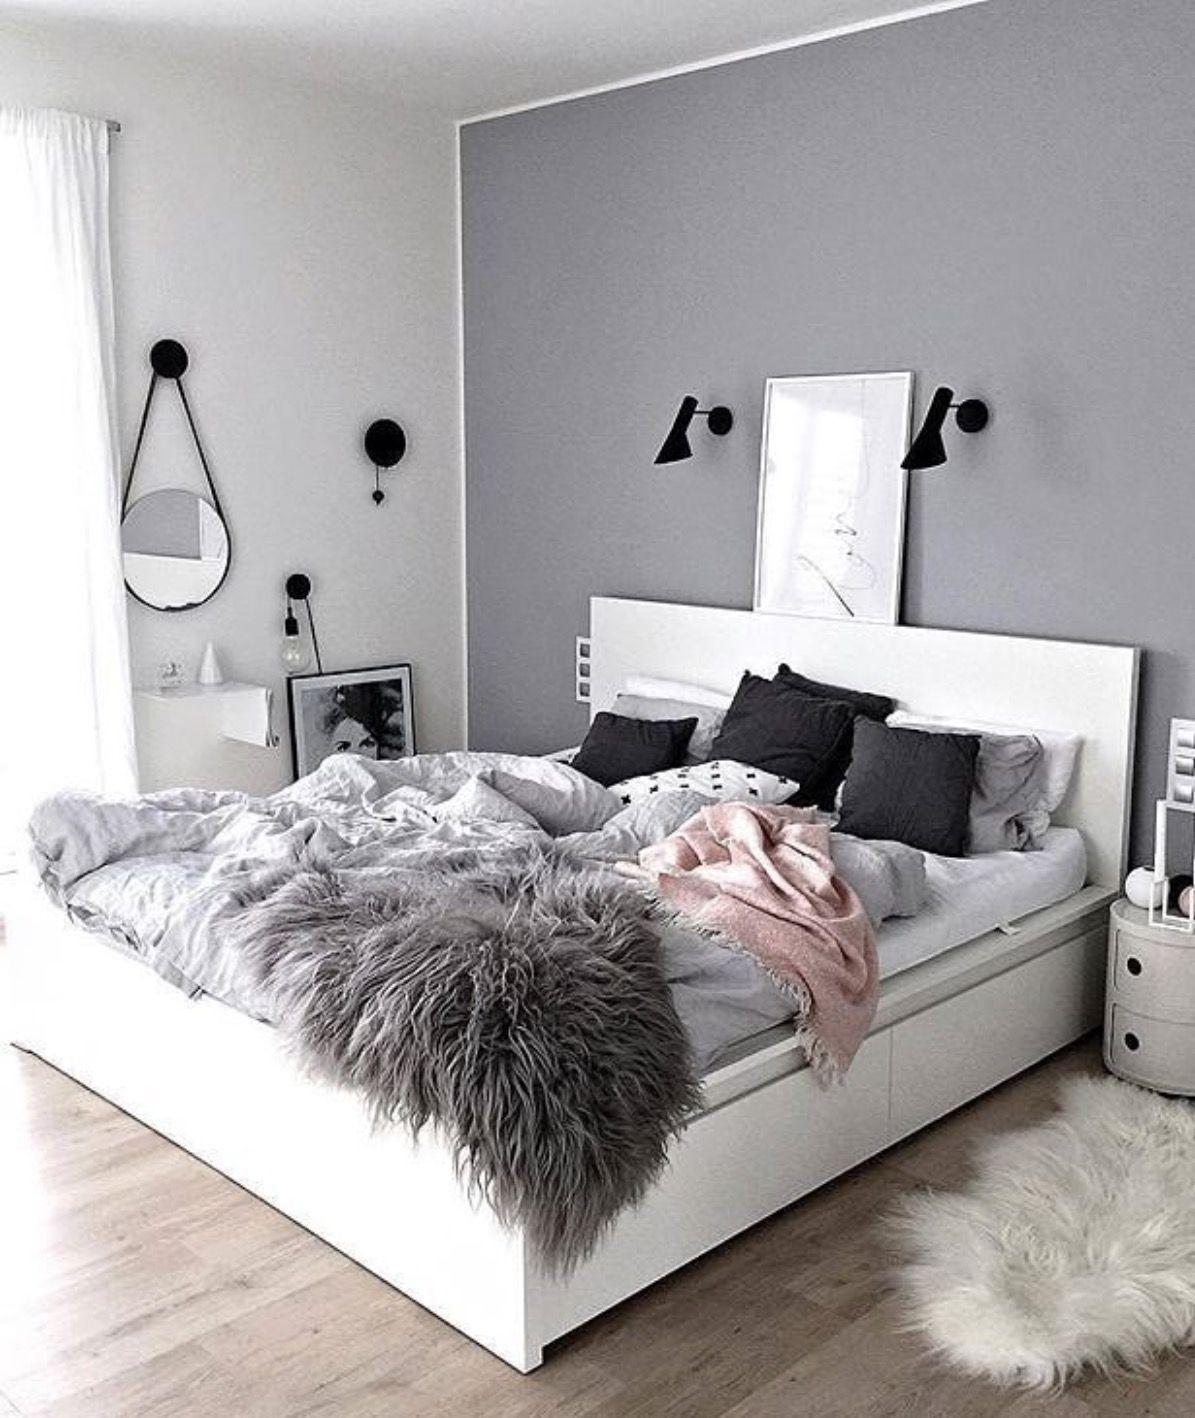 Wall decor for teen bedroom pin by feyza on oda tasarım  pinterest  bedroom room decor and room